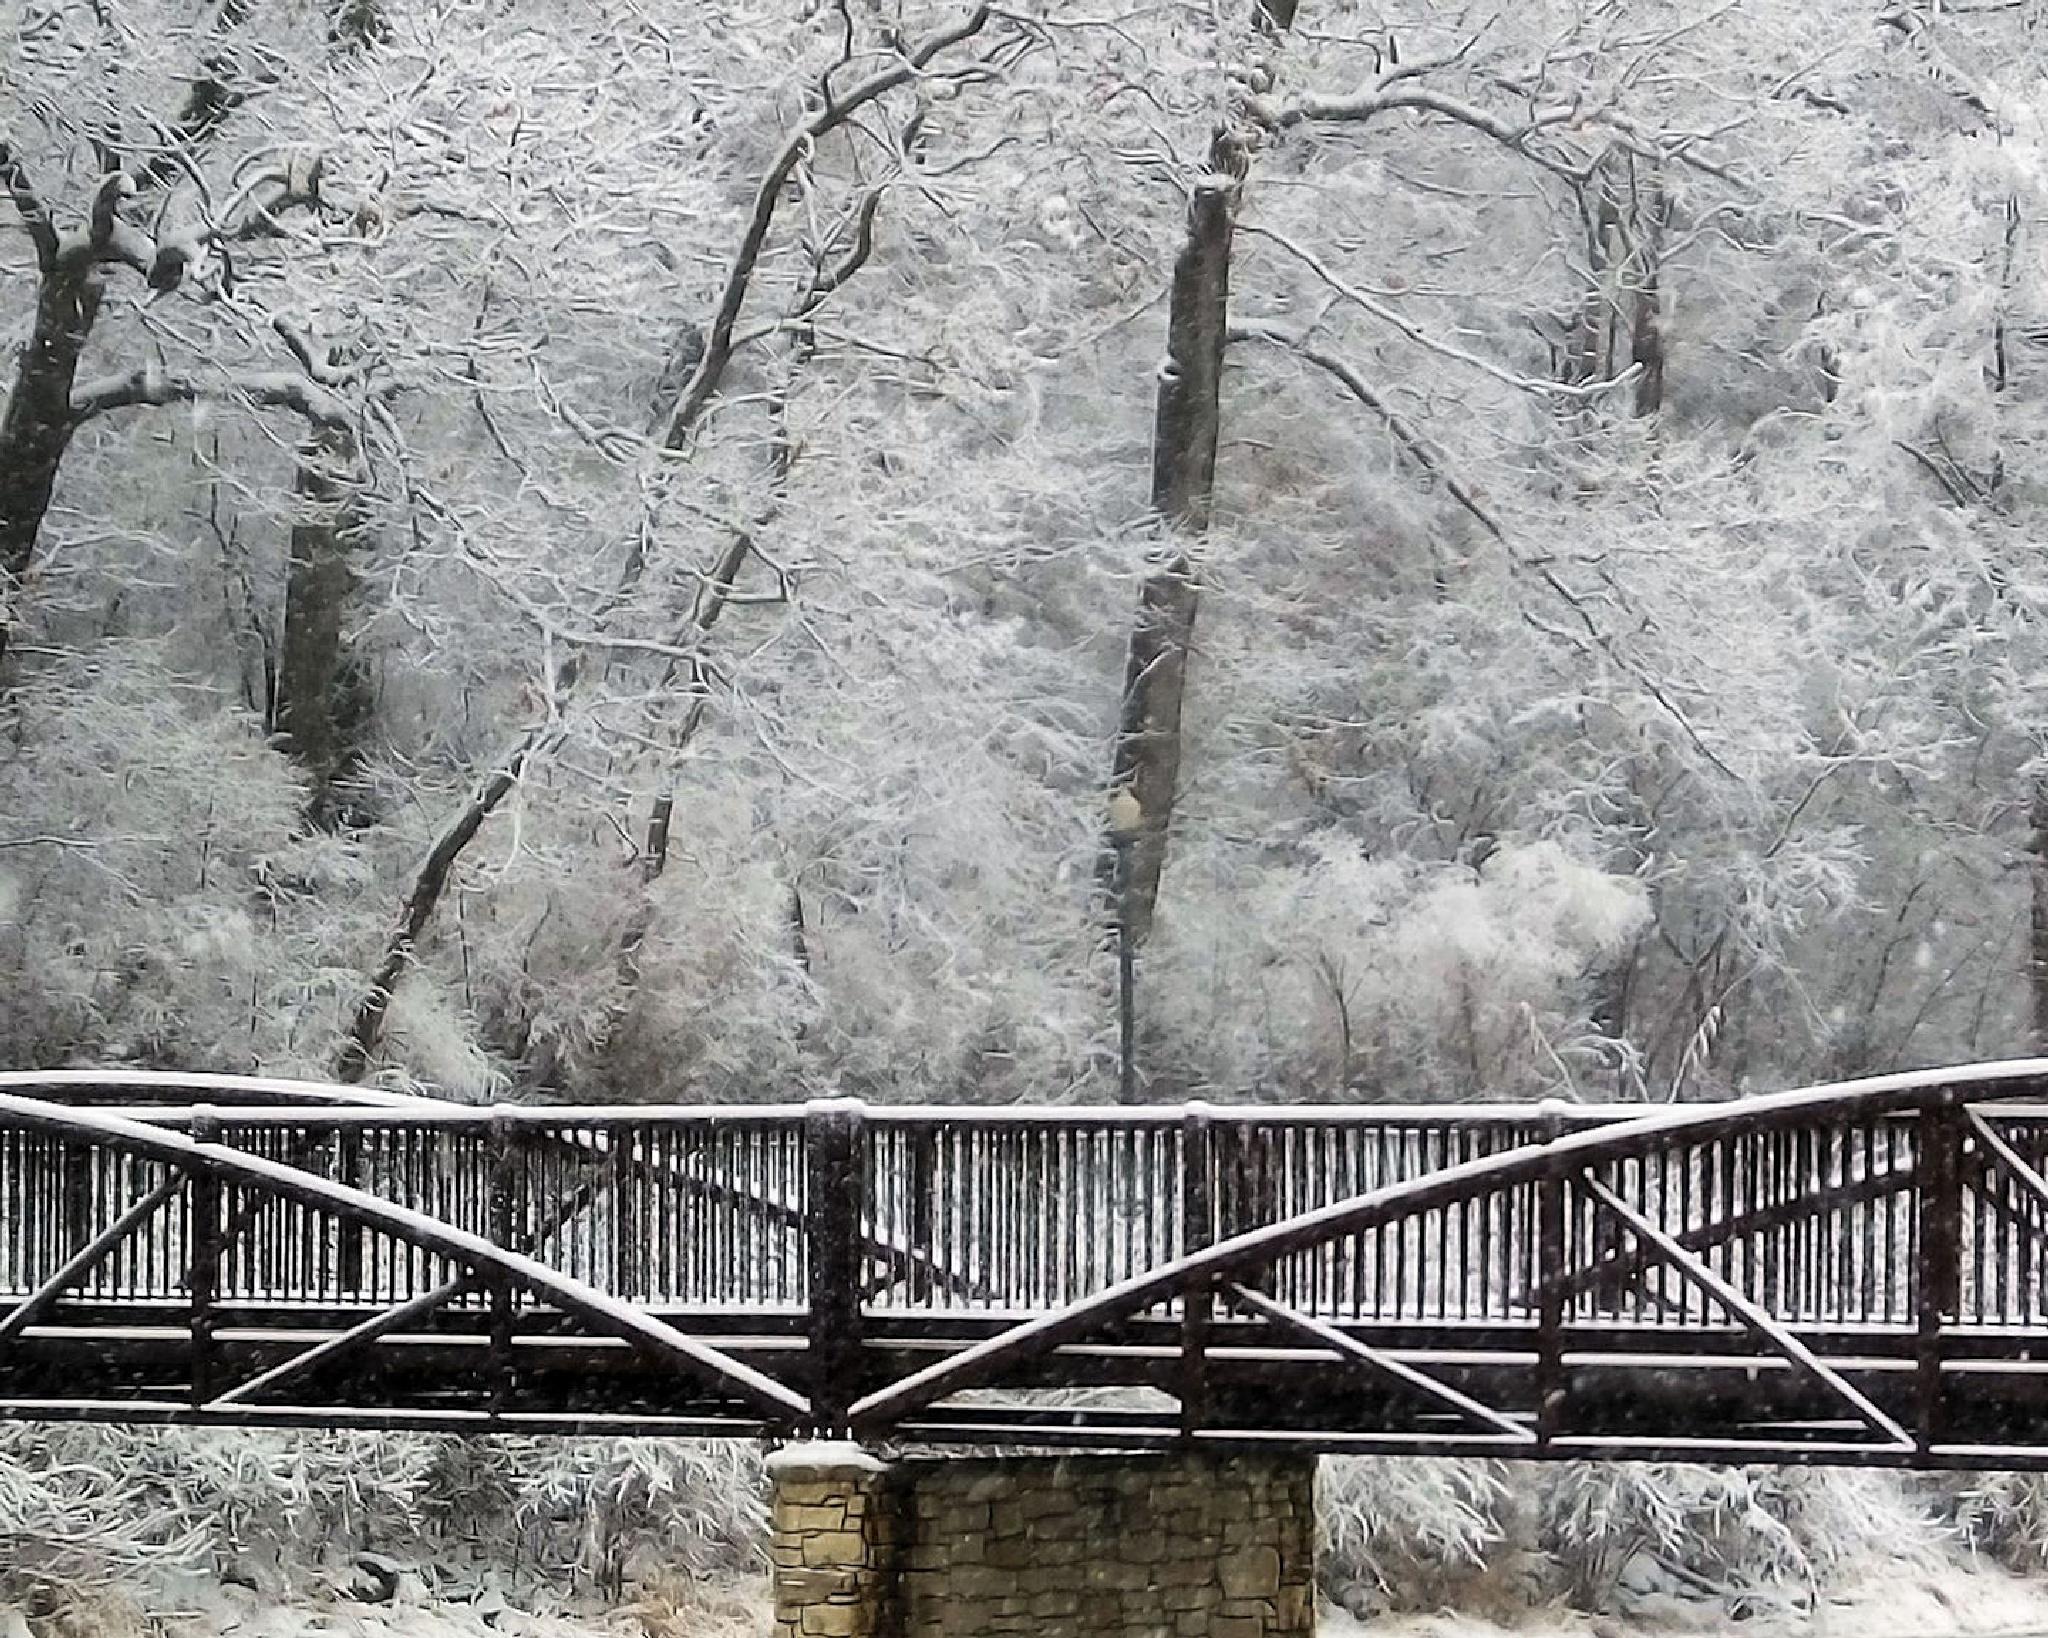 A Winter Day by Lynn A Marie